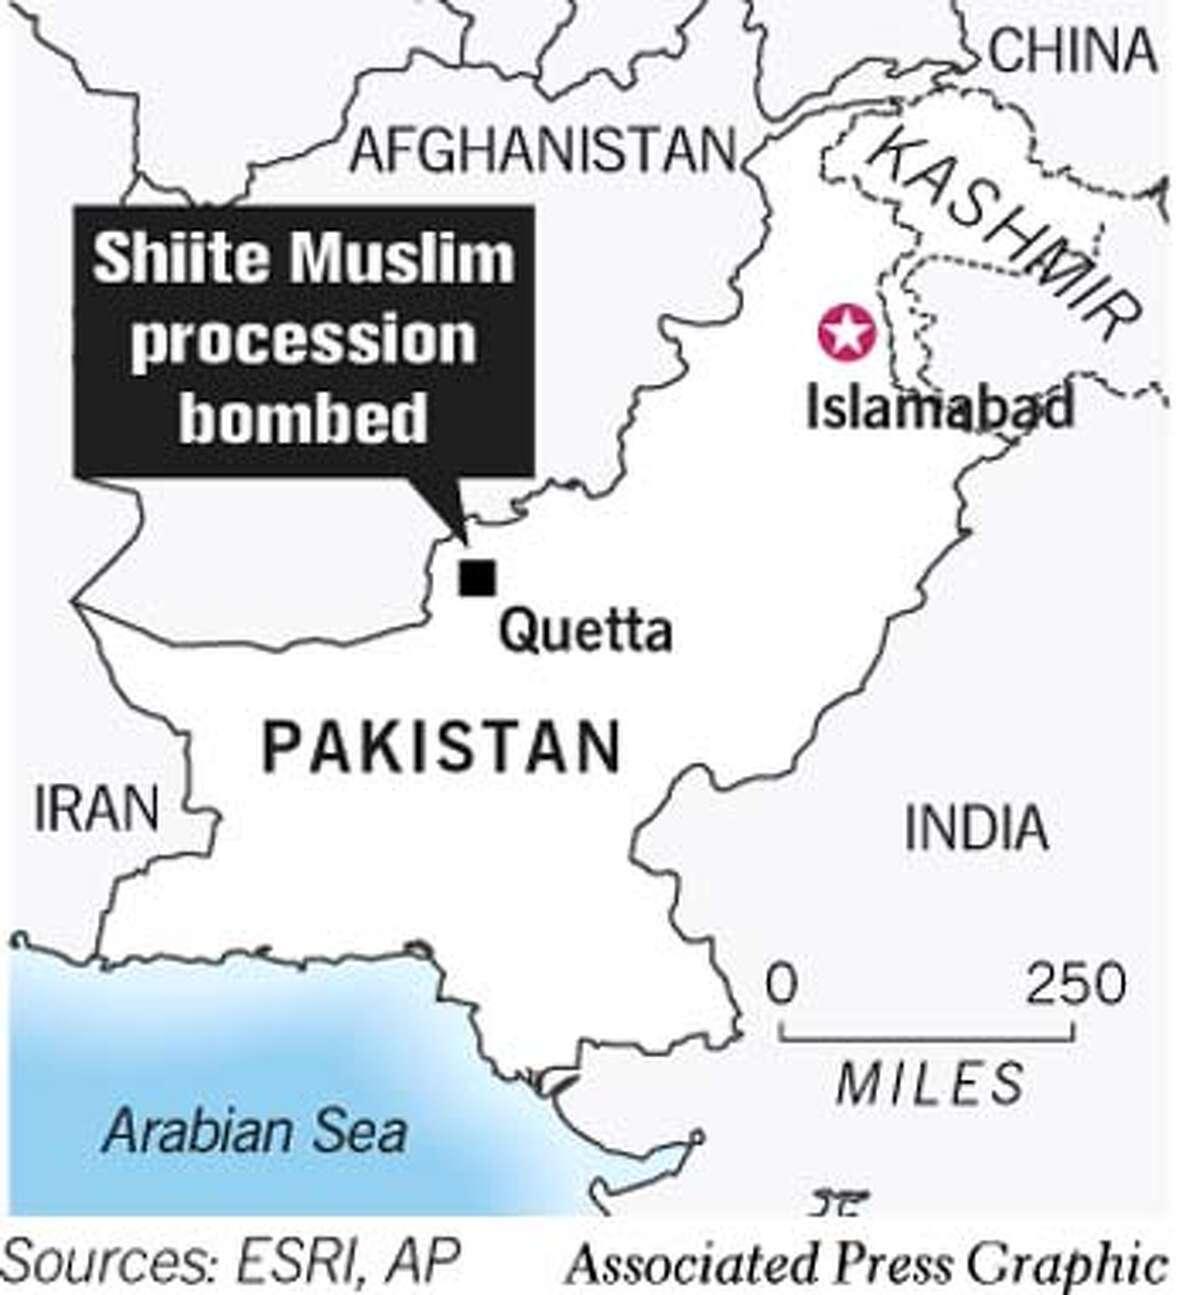 Pakistan. Associated Press Graphic